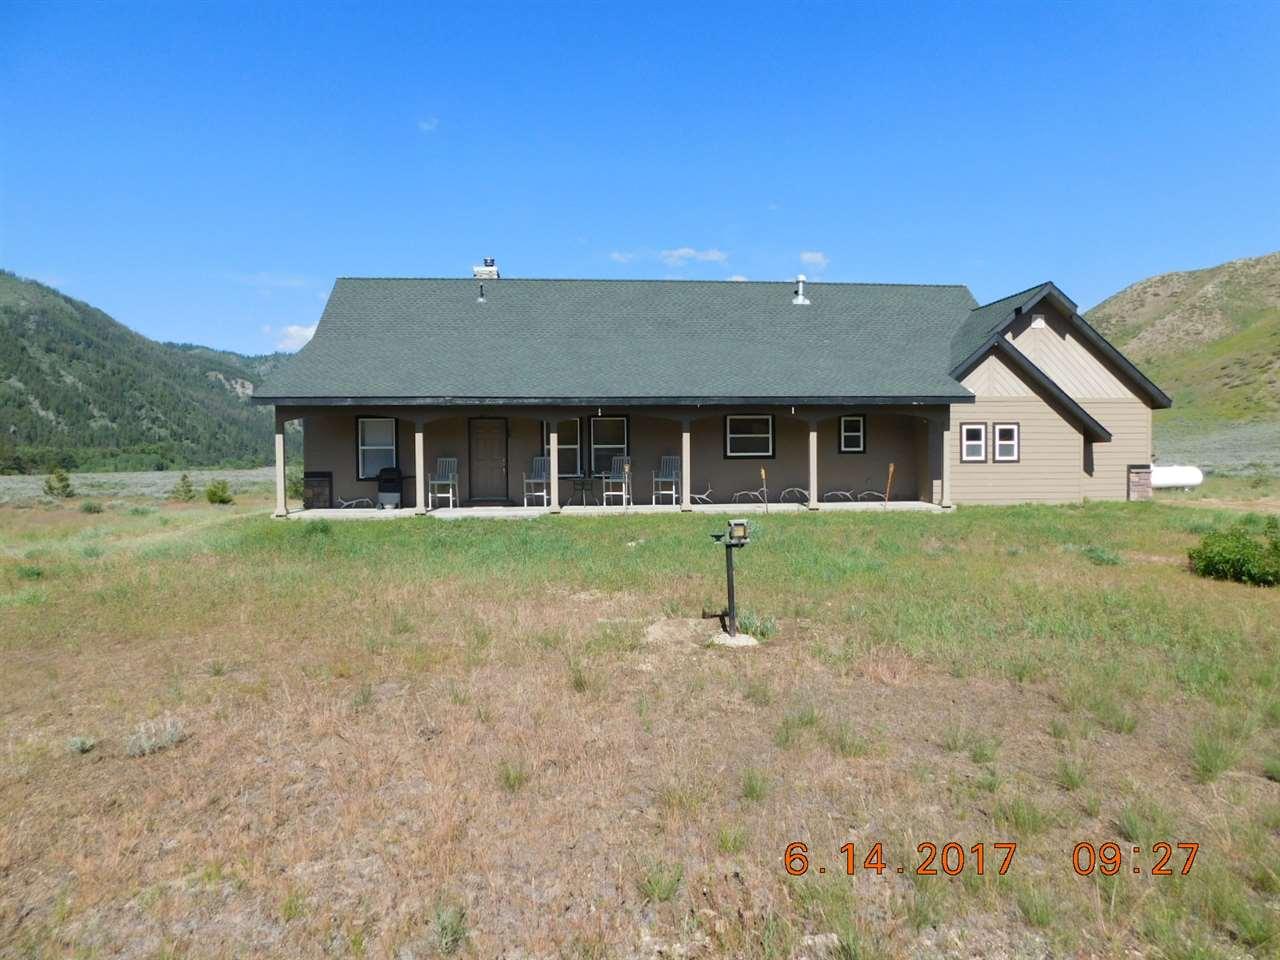 独户住宅 为 销售 在 5190 E Baumgartner Rd Featherville, 爱达荷州 83647